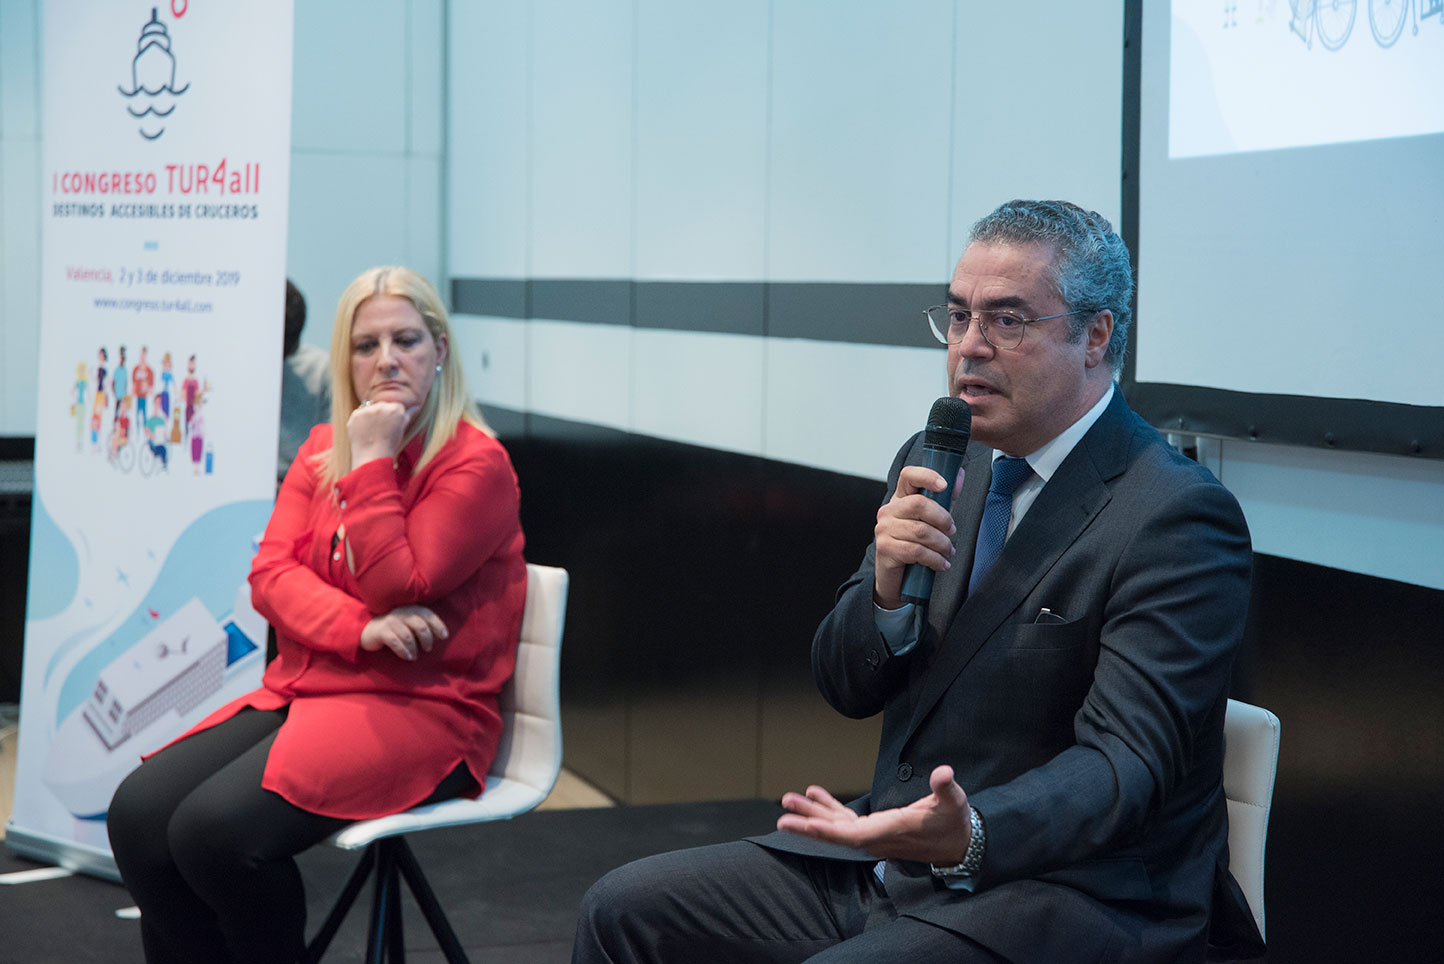 Malik-Alkarea-Virginia-Lopez- Presentation-Congress-Madrid-in-November